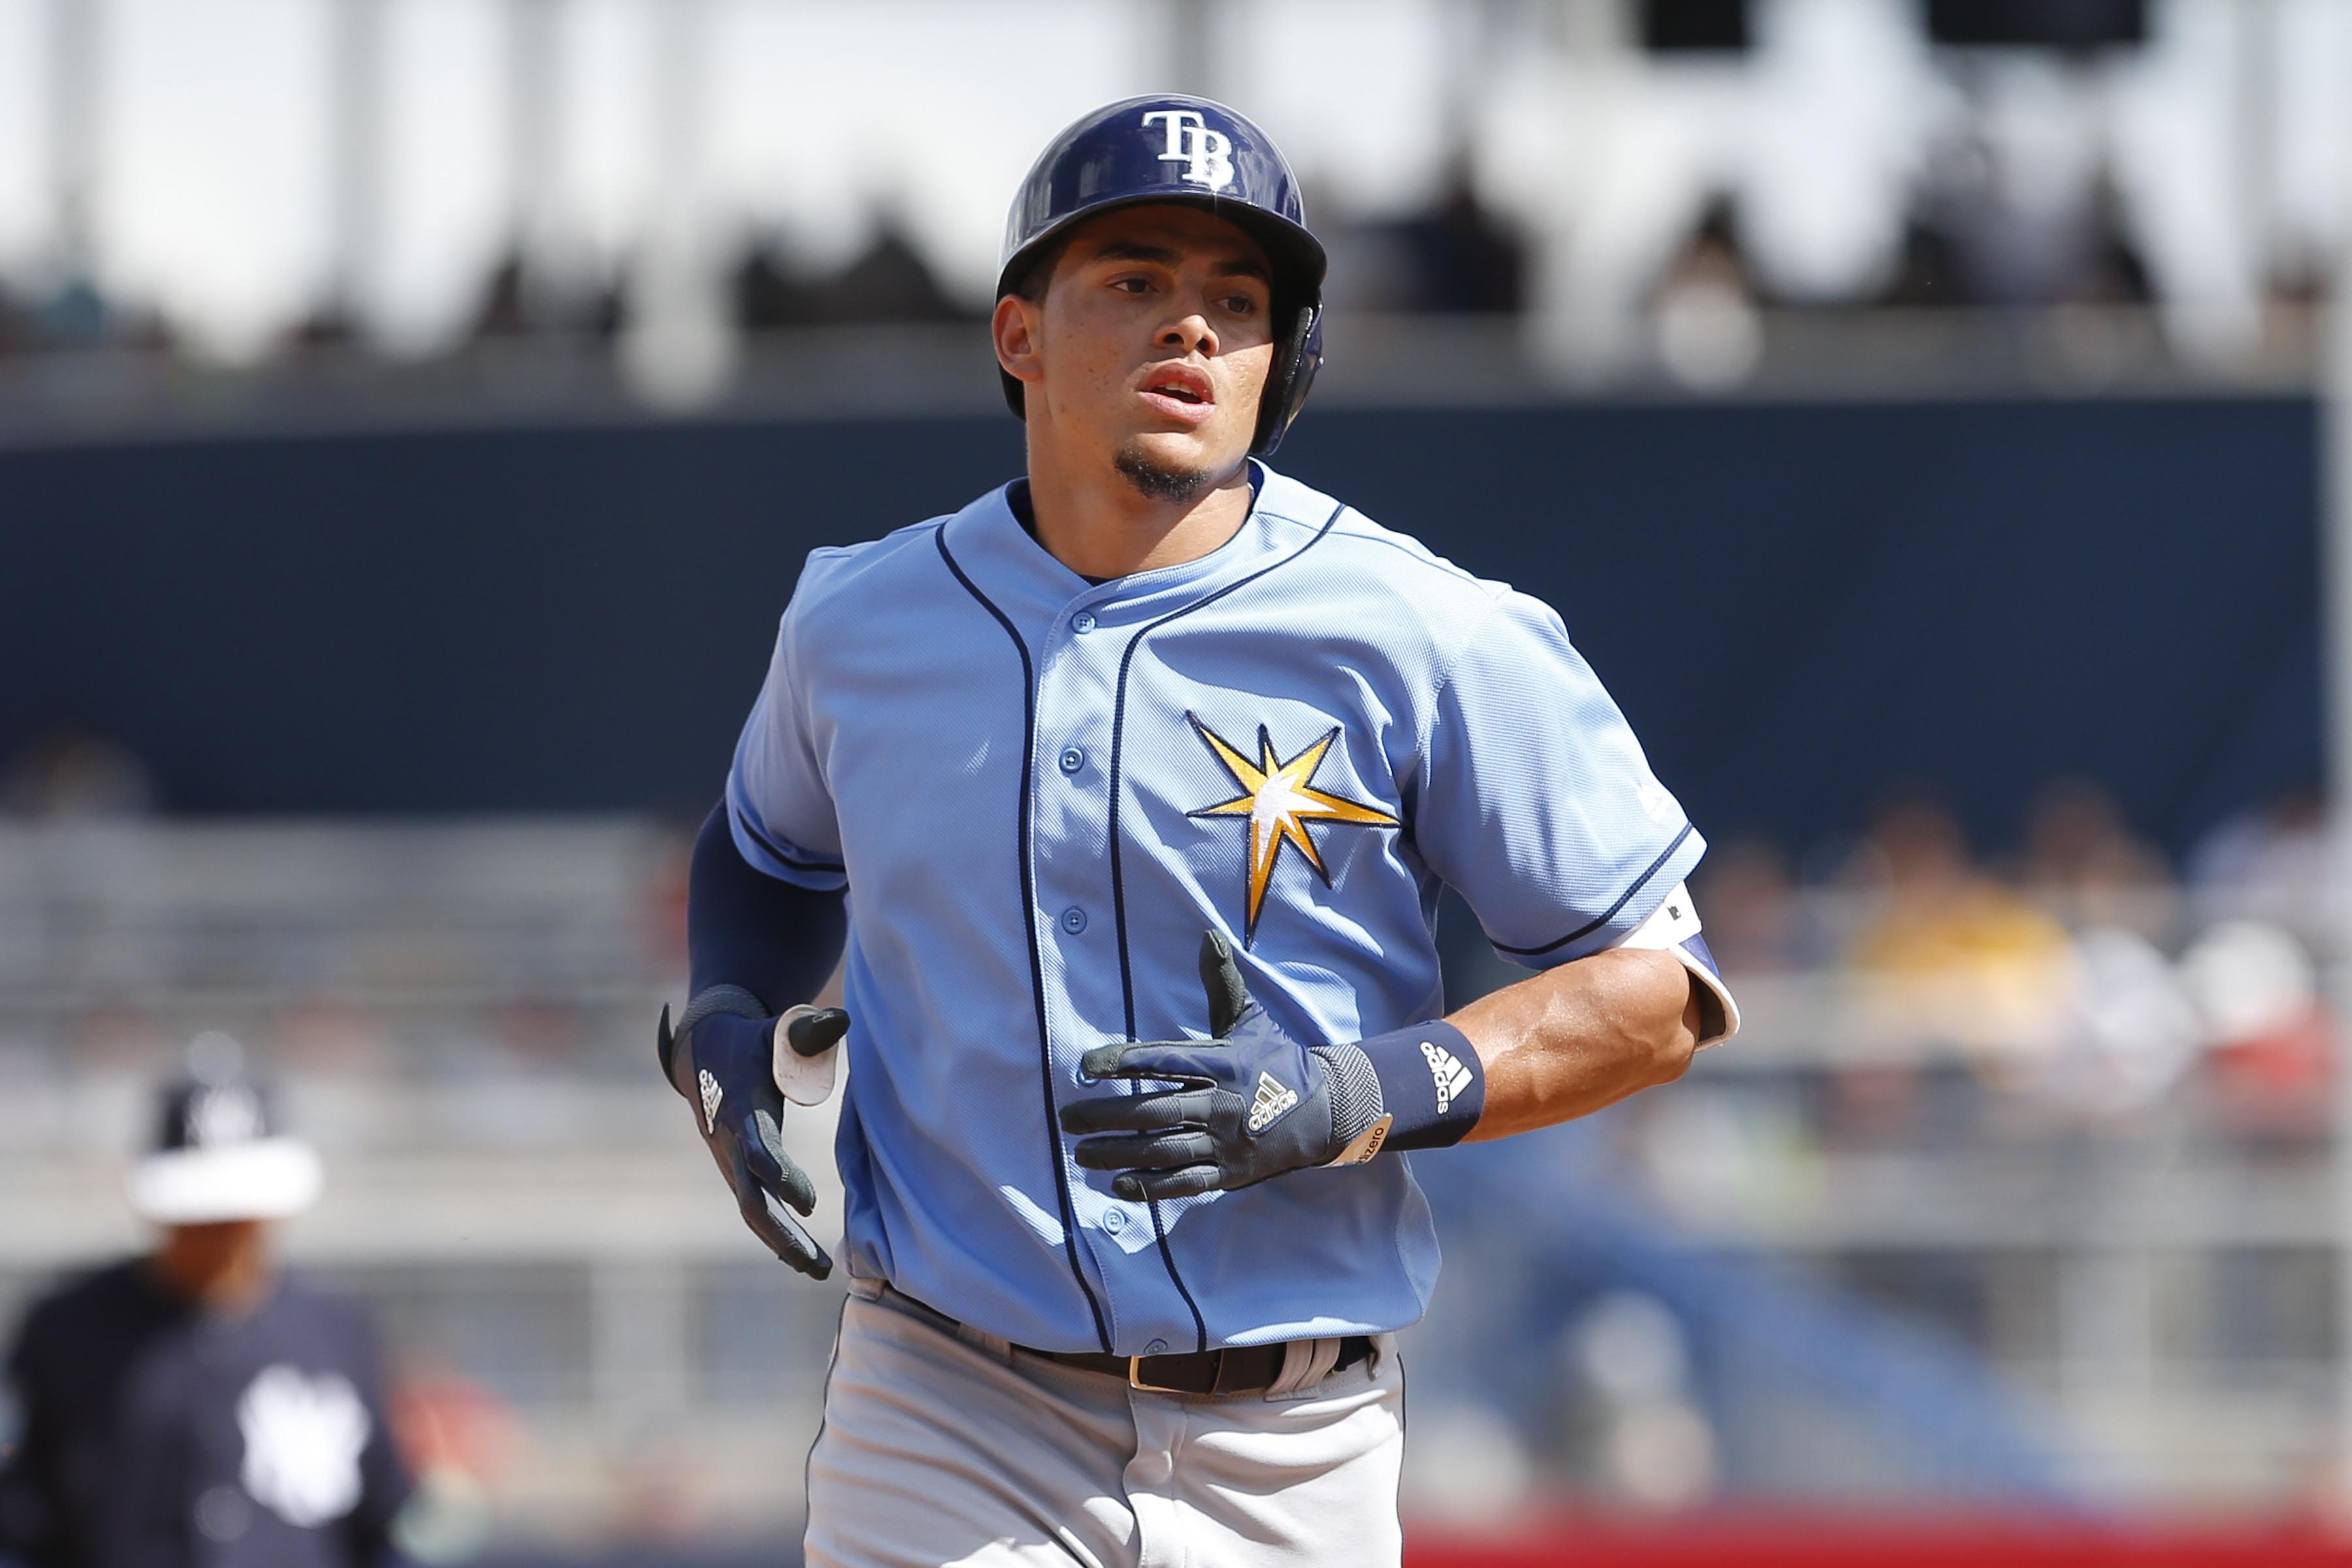 MLB: MAR 07 Spring Training - Rays at Yankees